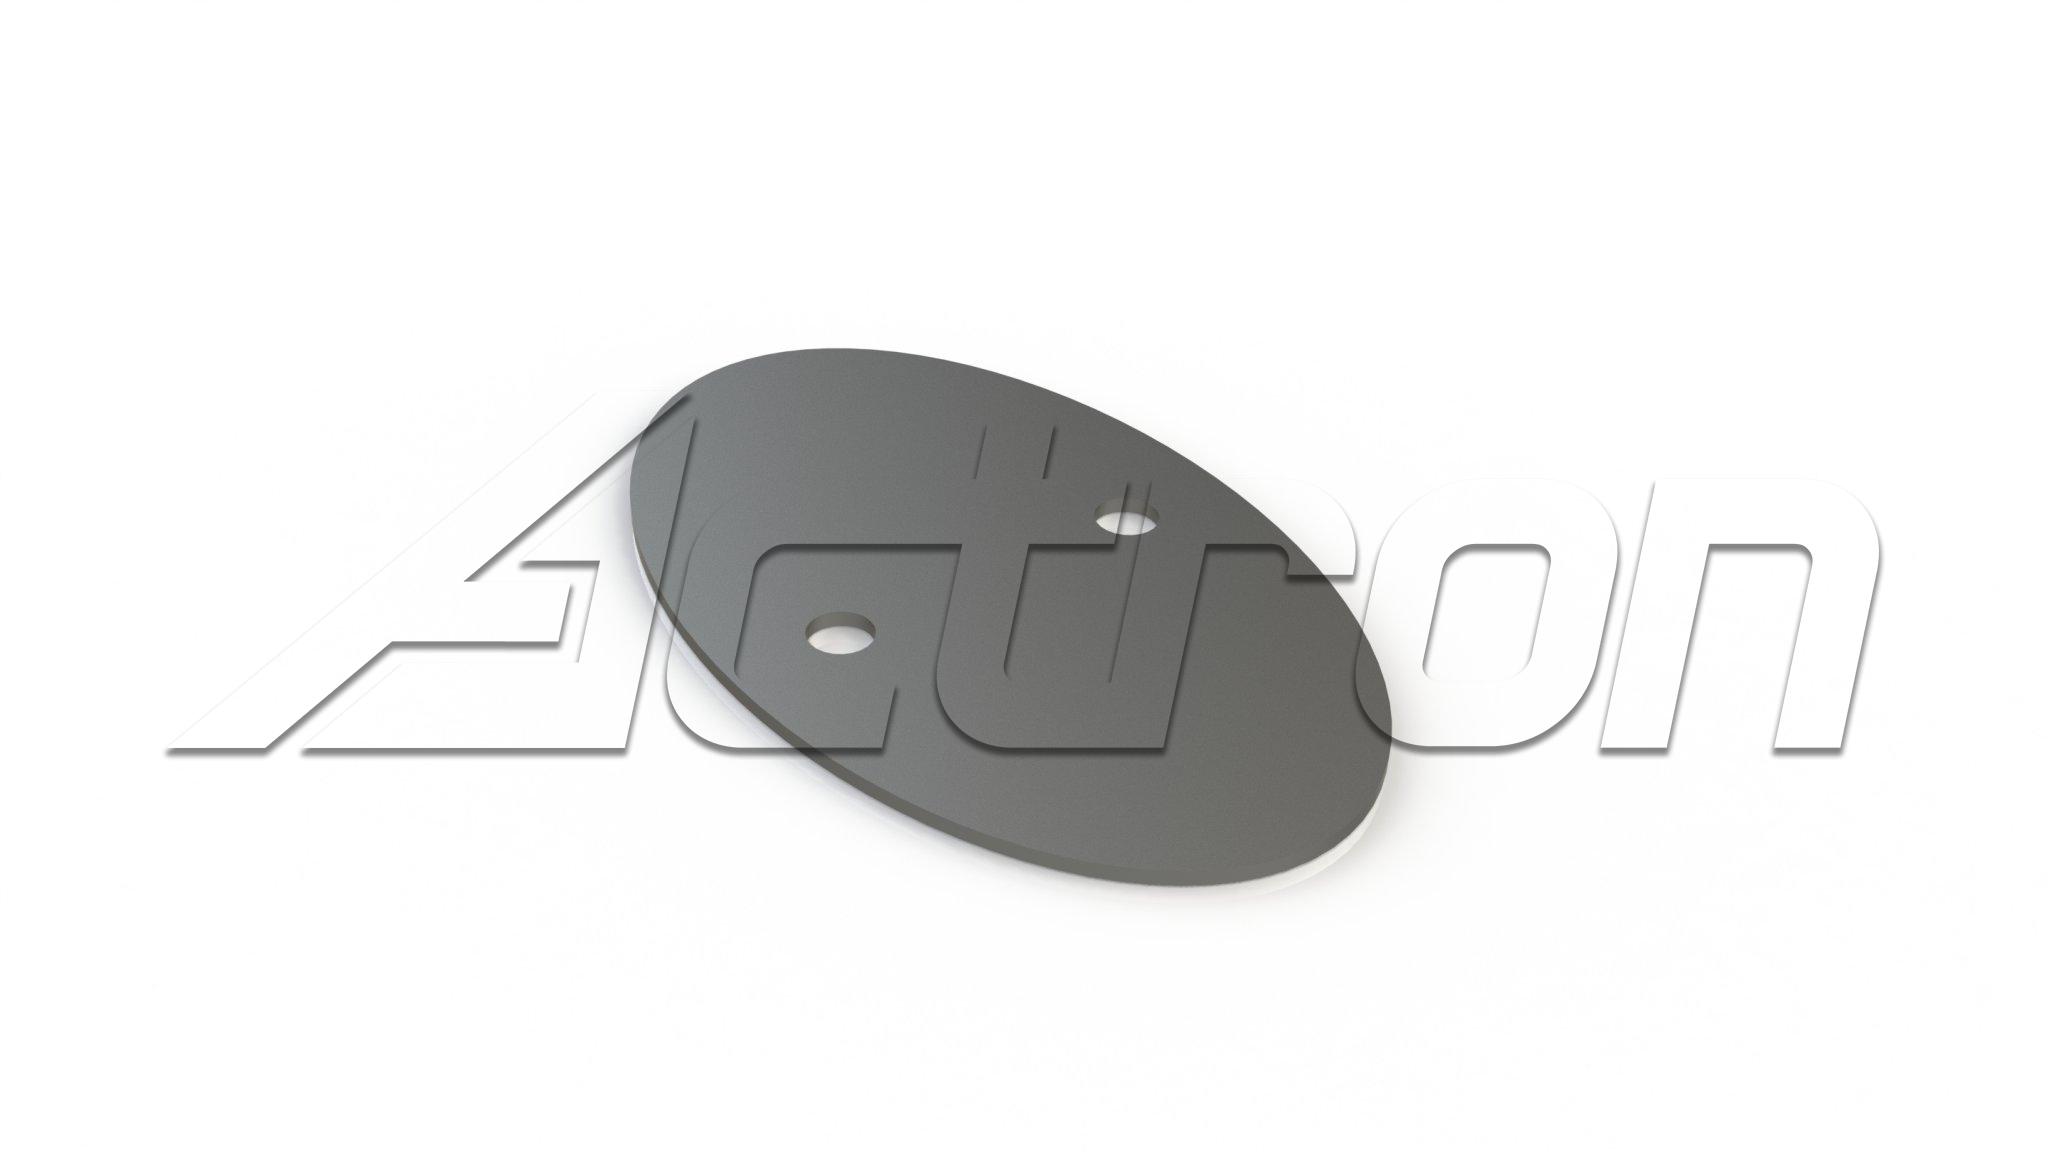 mounting-plate-8211-latch-5286-a44006.jpg